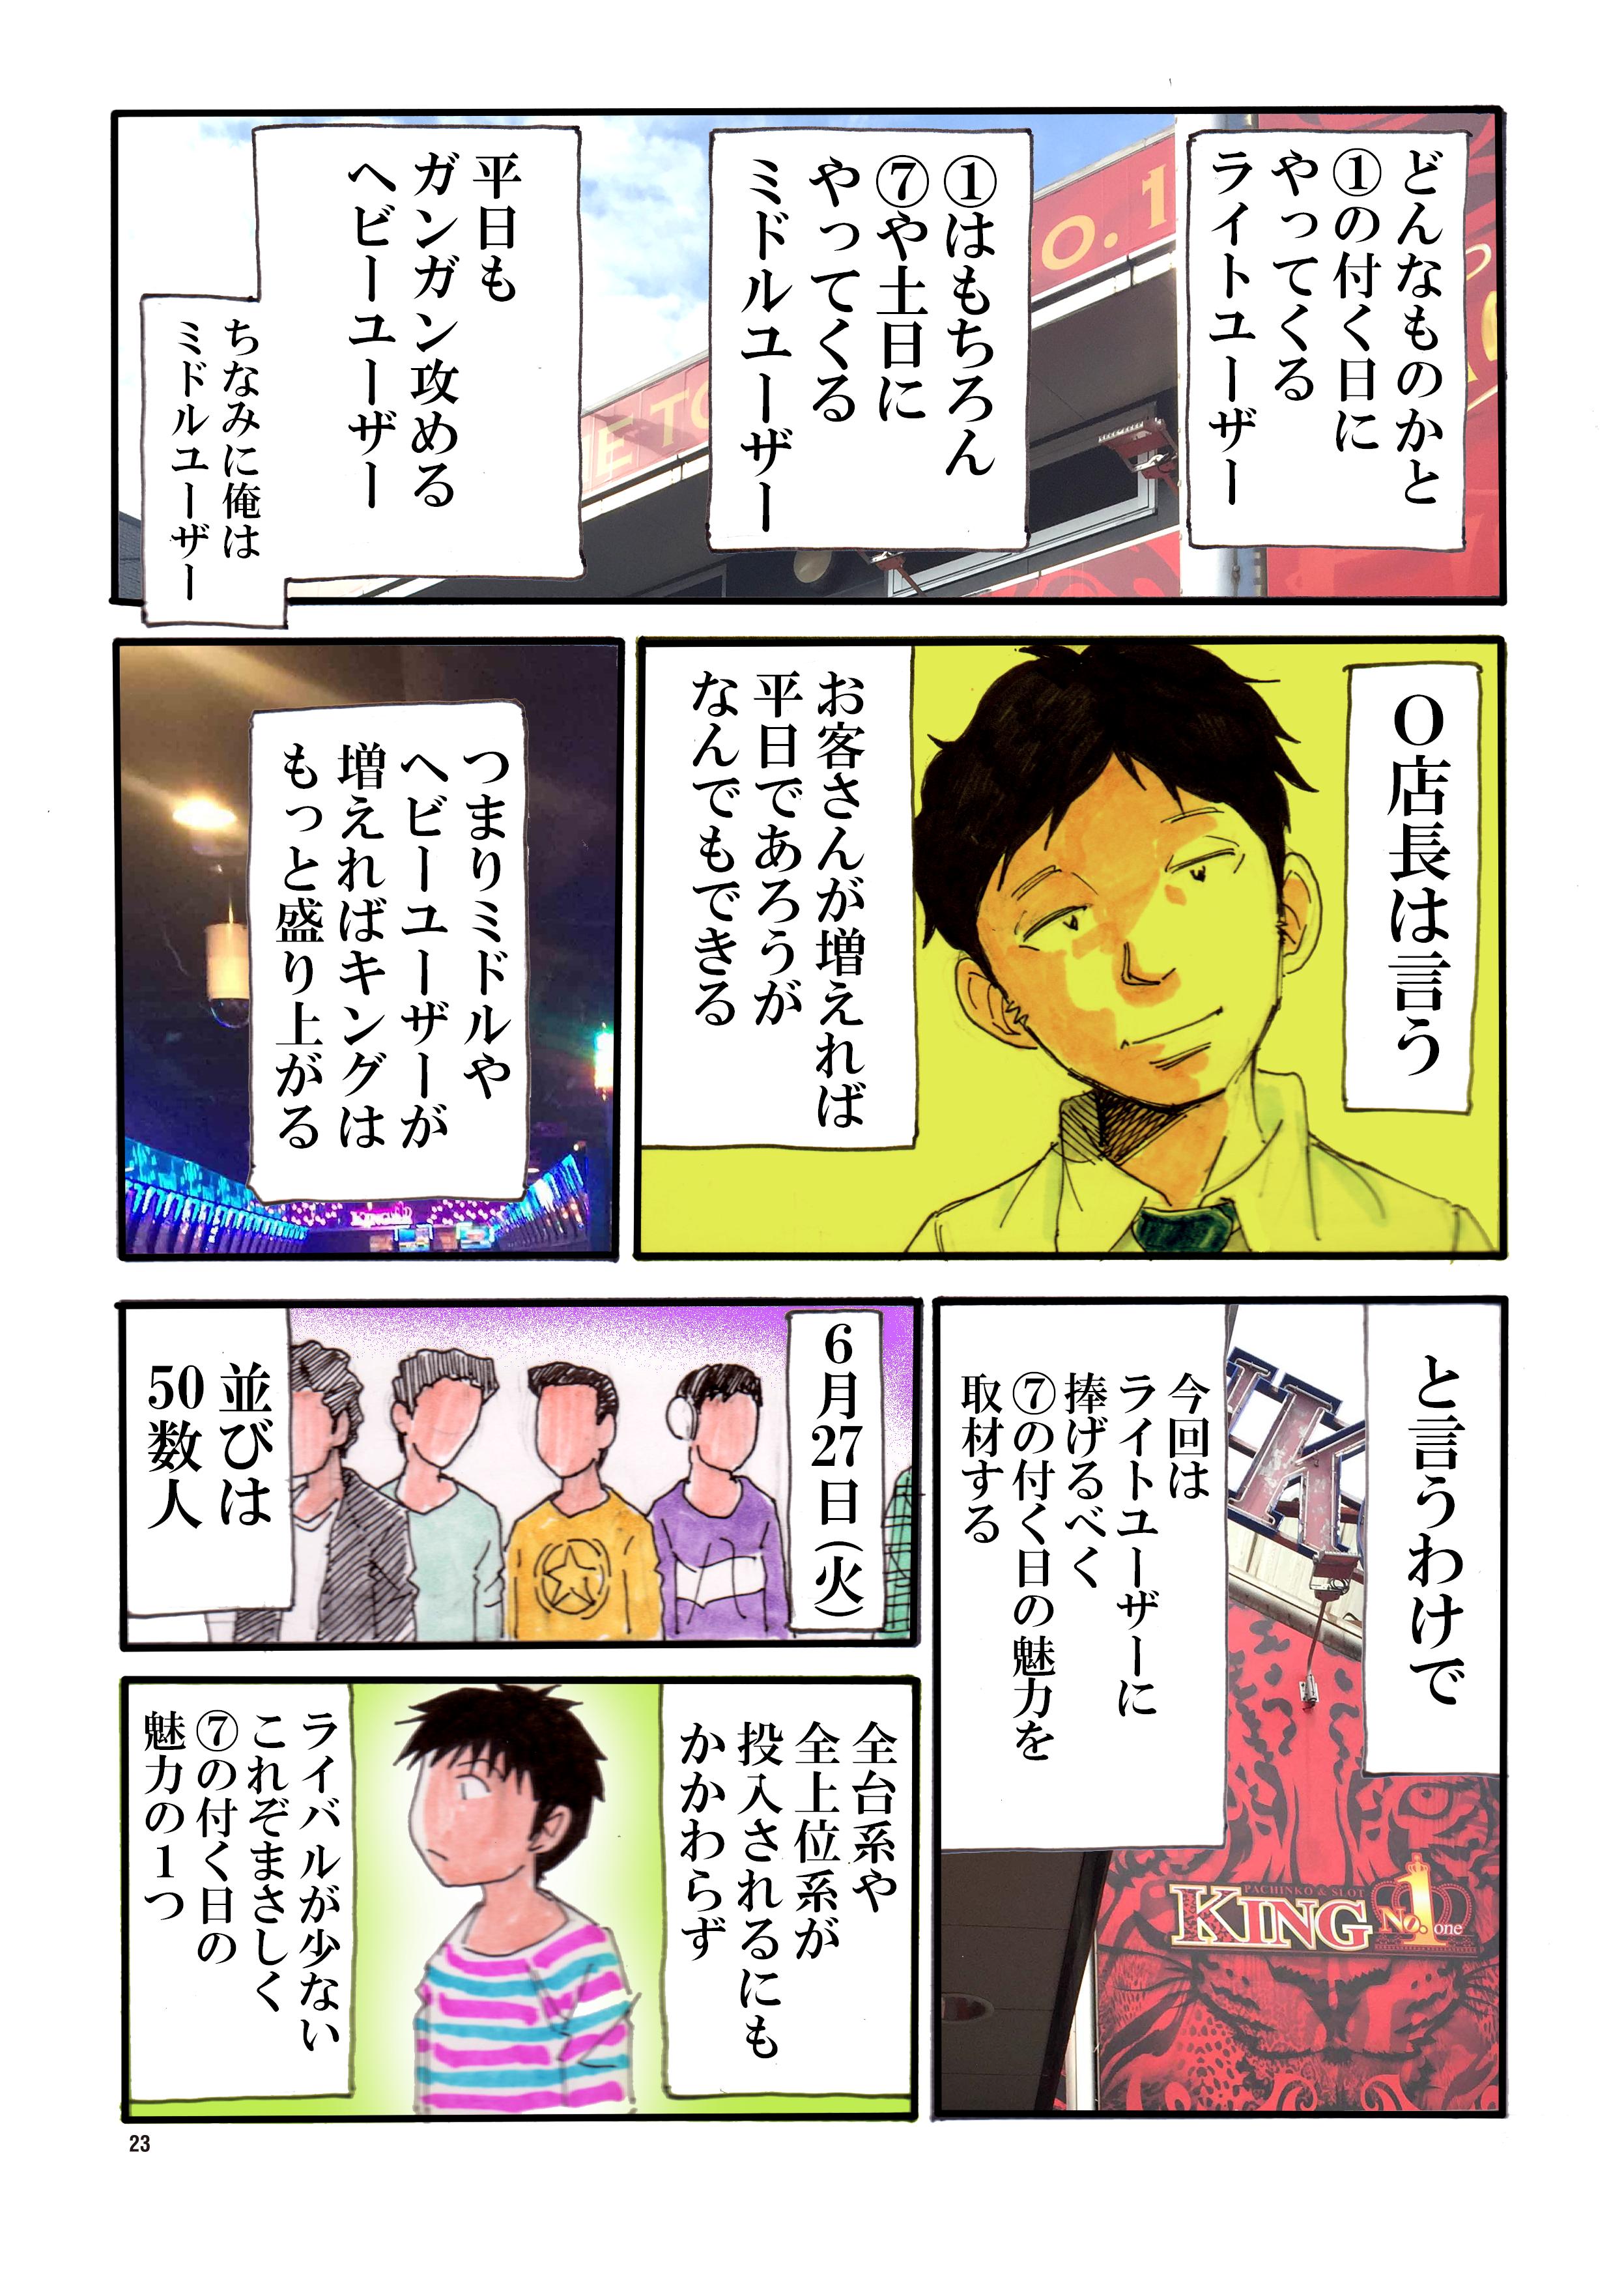 vol.5-3キング大解析